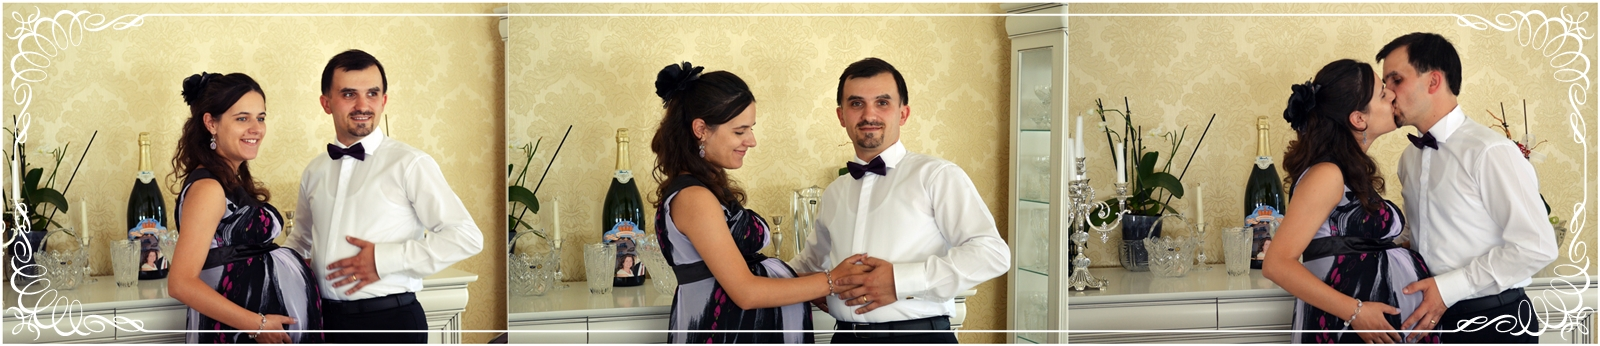 nunta de hartie viitori parinti